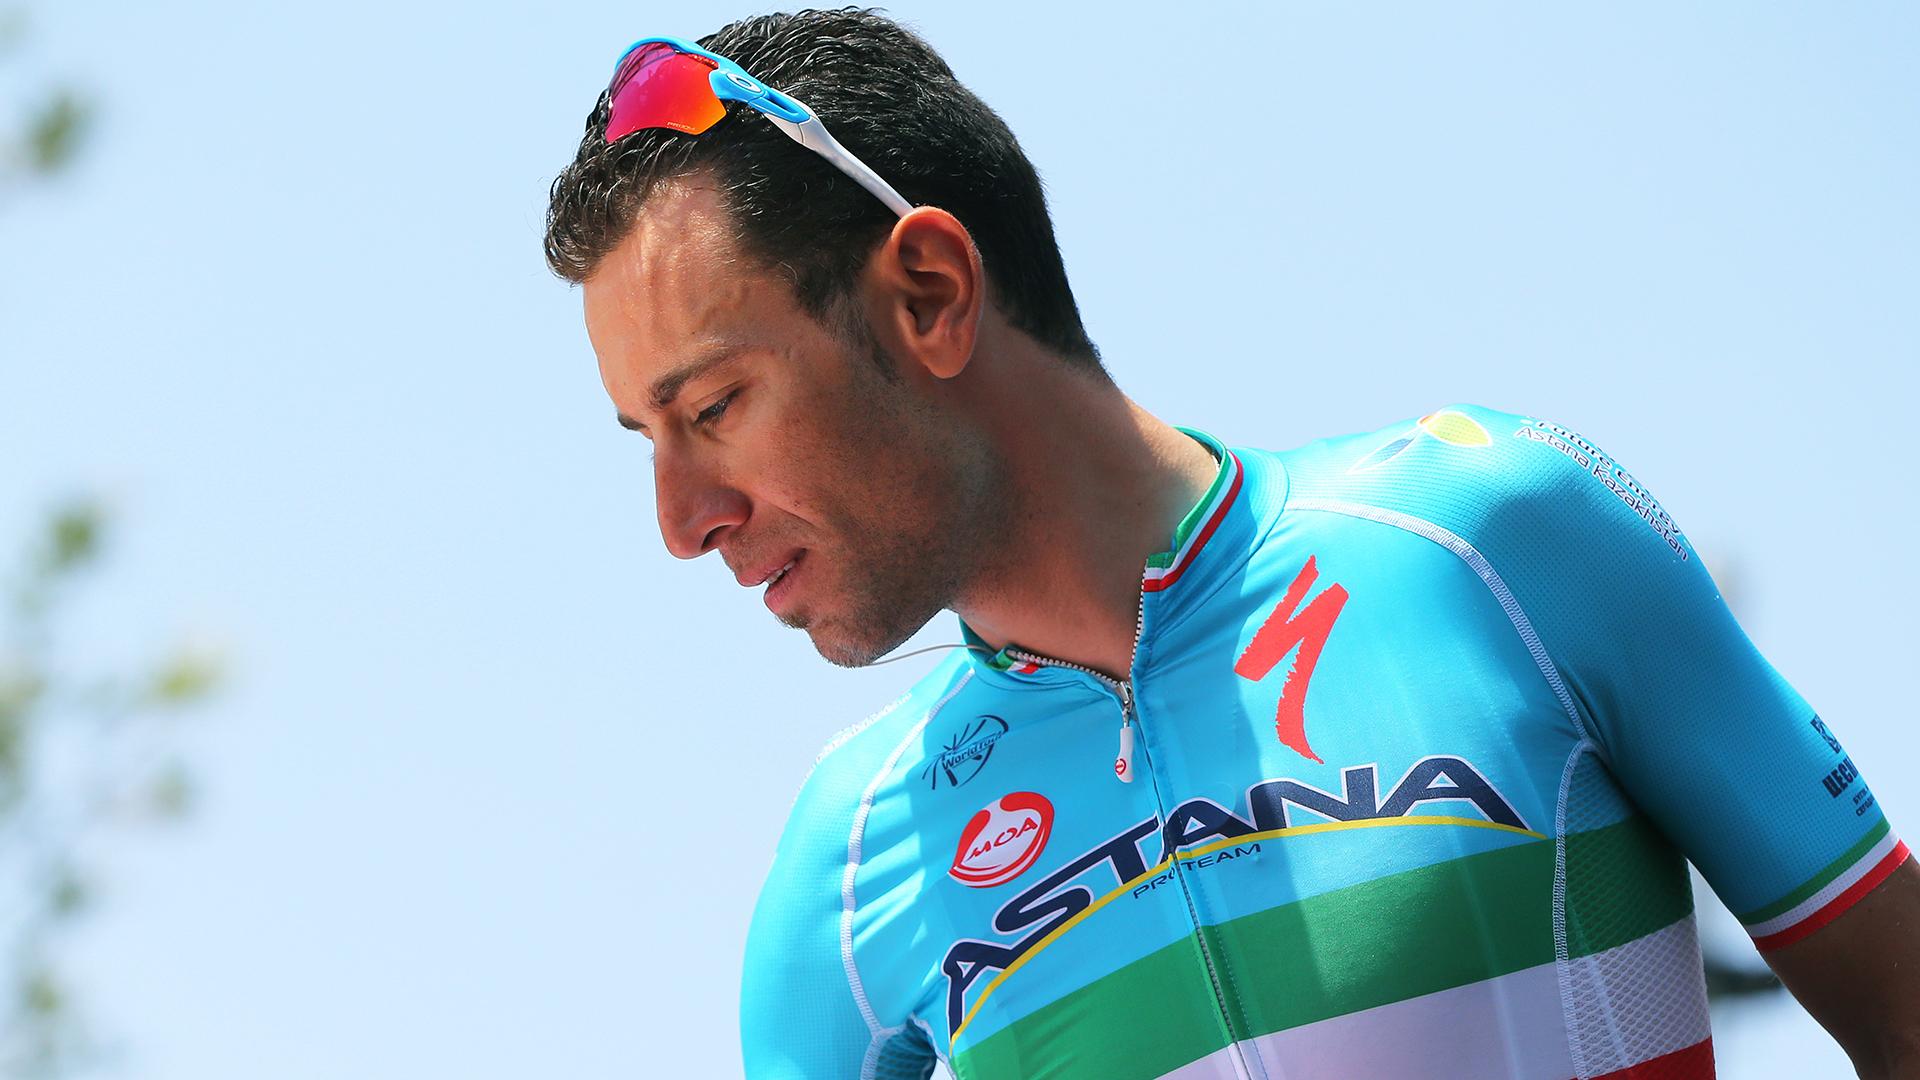 Ciclomercato: Vincenzo Nibali torna alla Astana